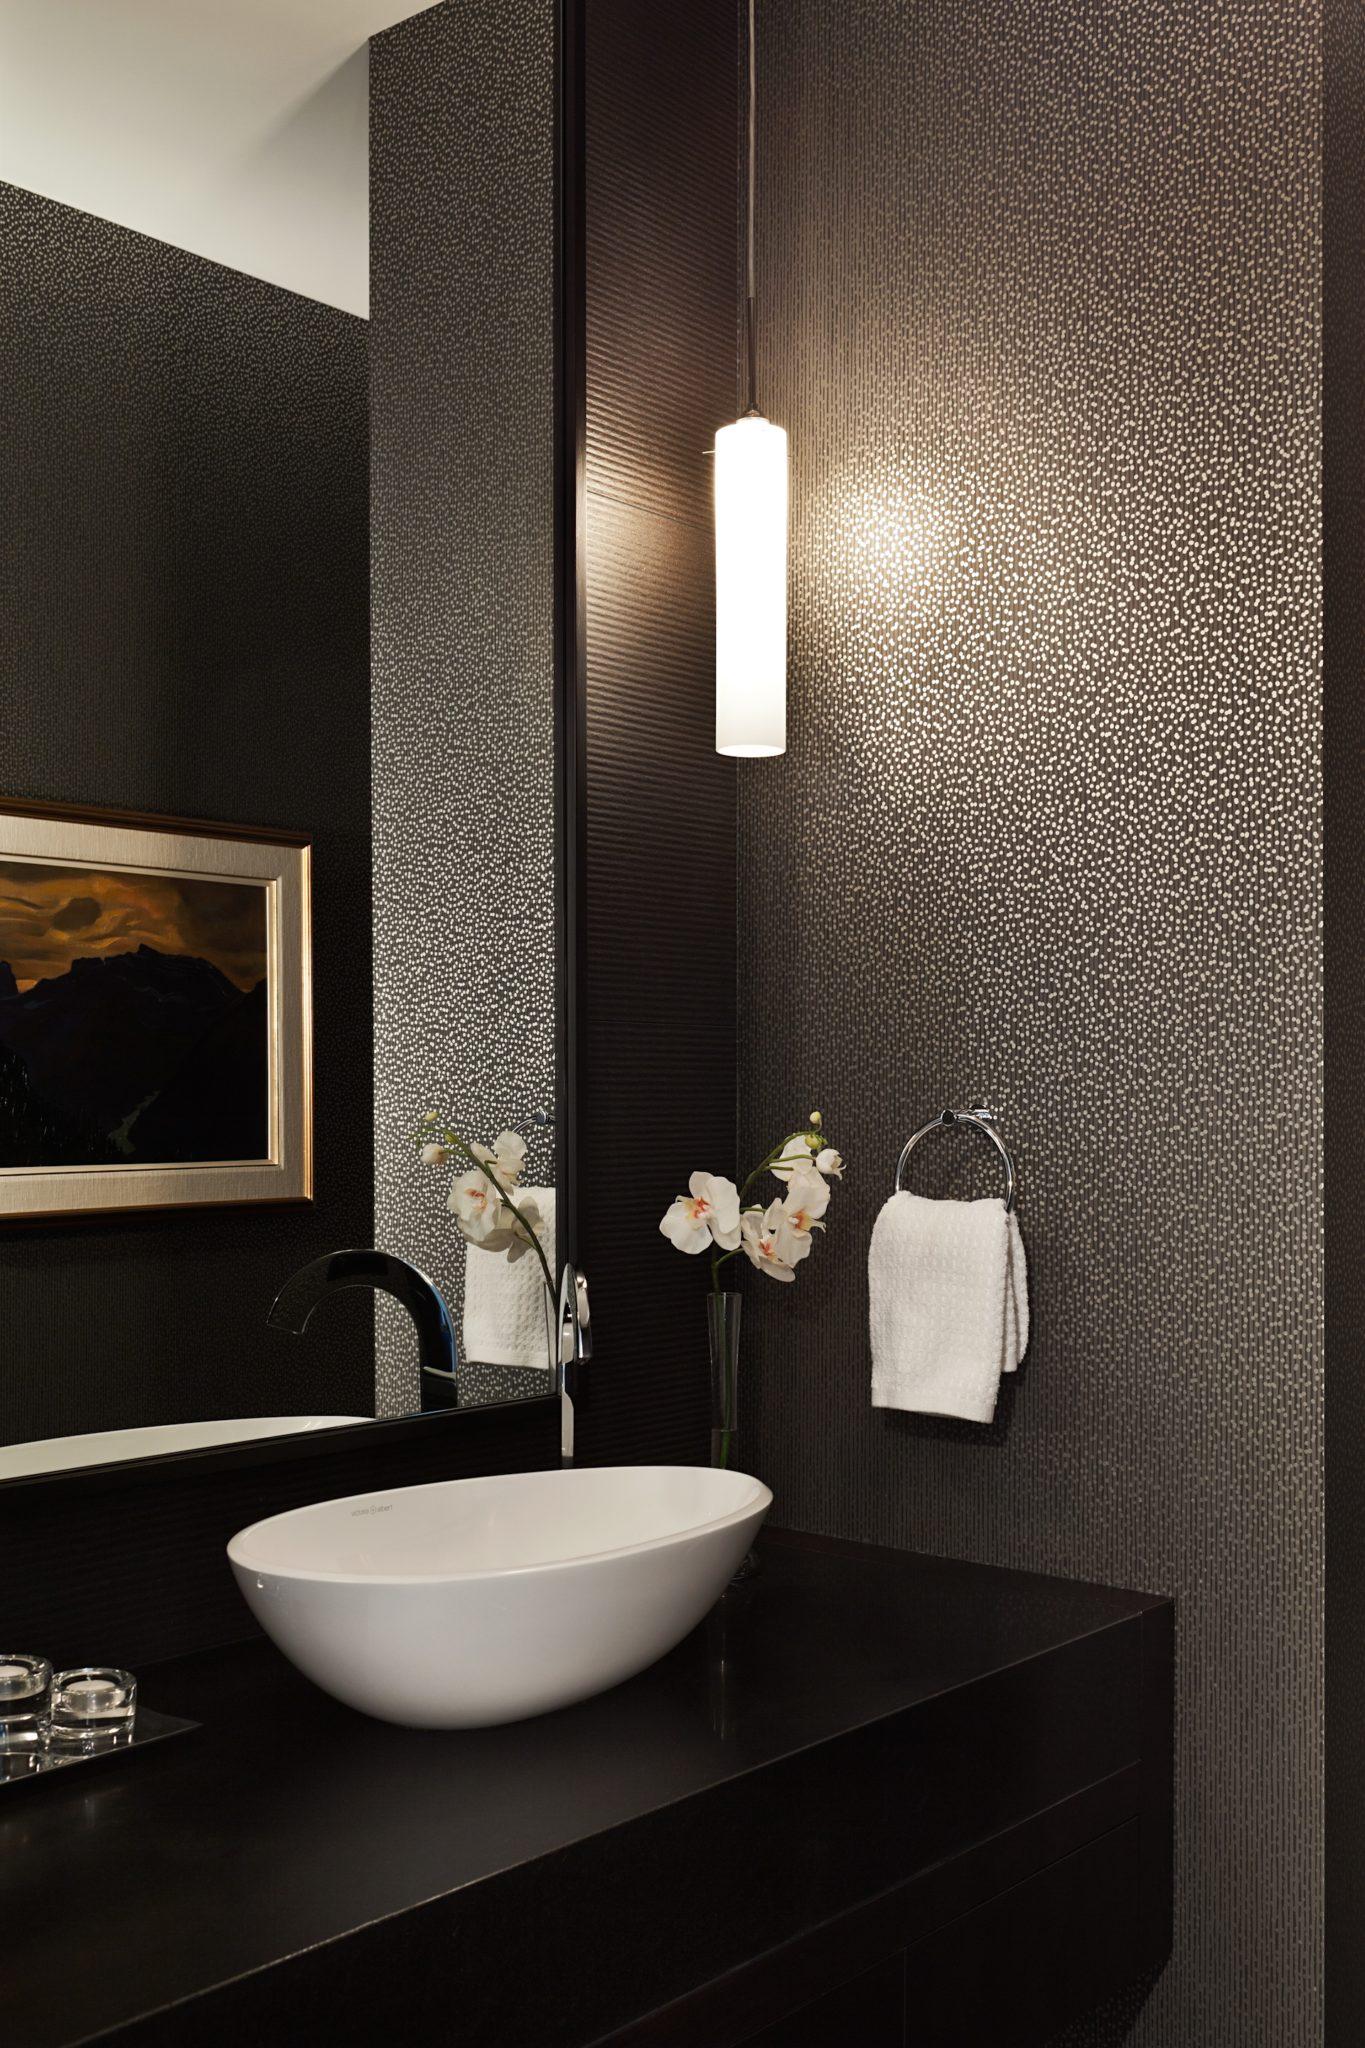 Edenbridge Humber Valley Home - powder room by Jennifer Worts Design